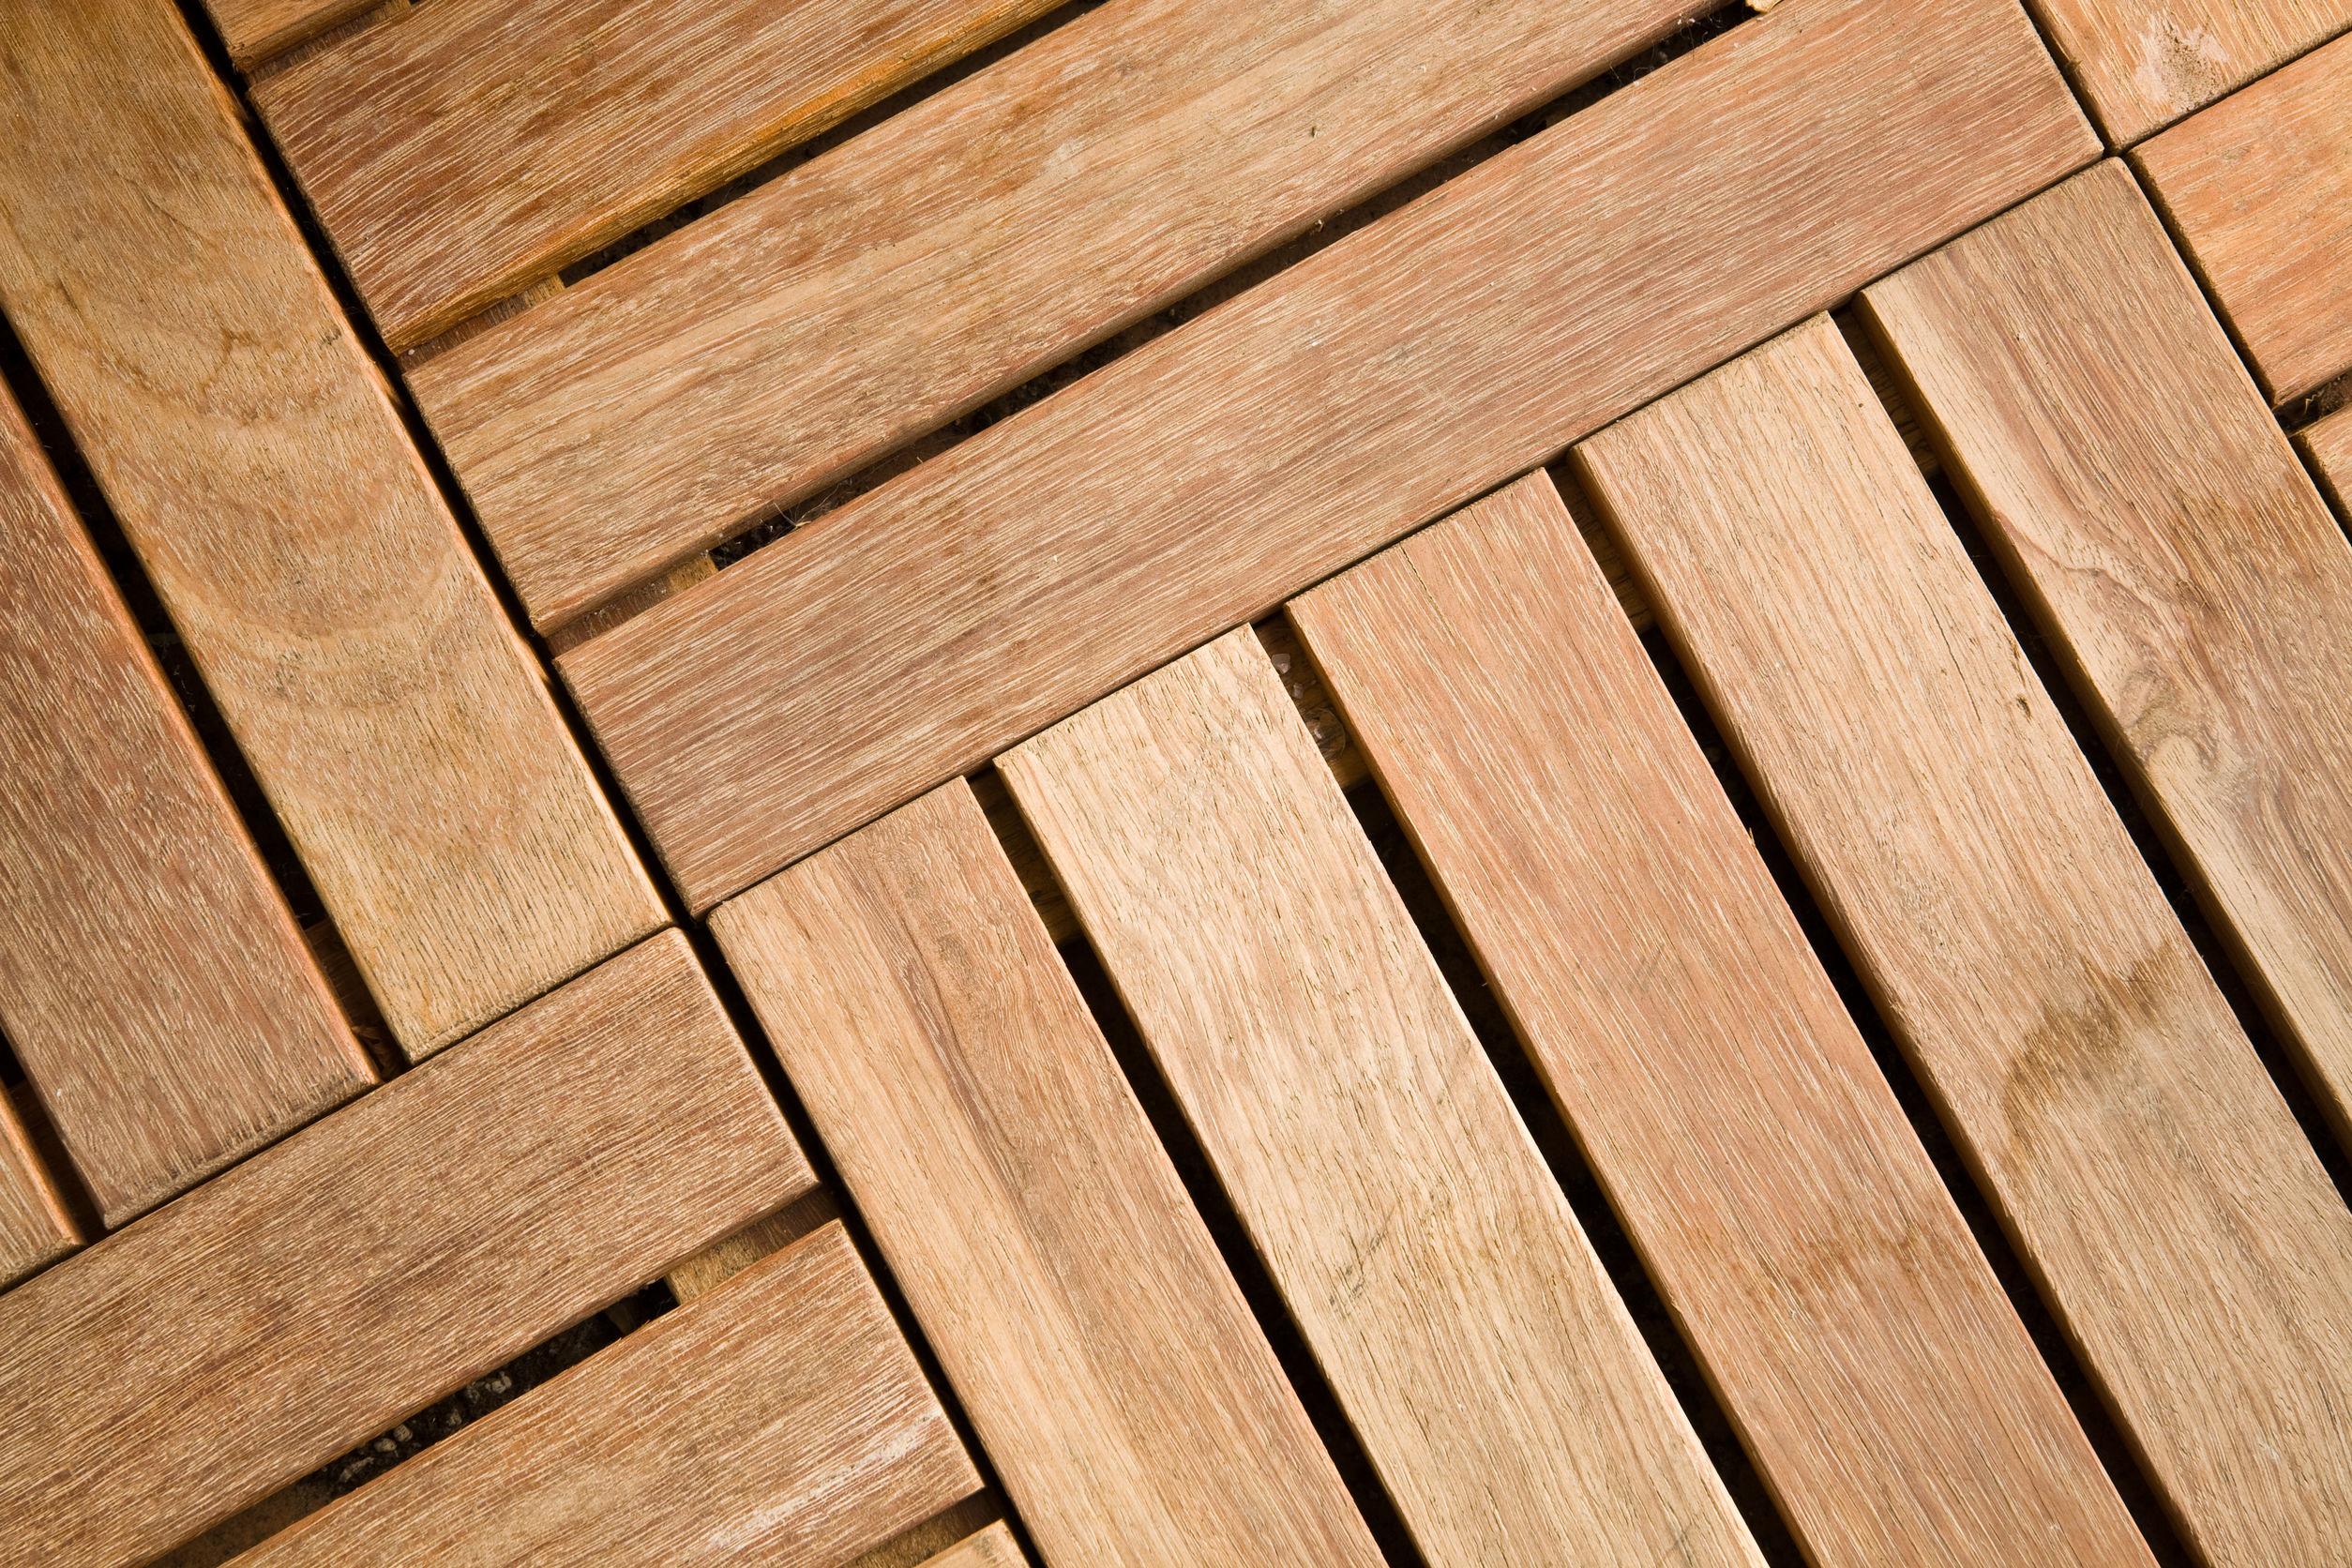 Fliesen aus Holz